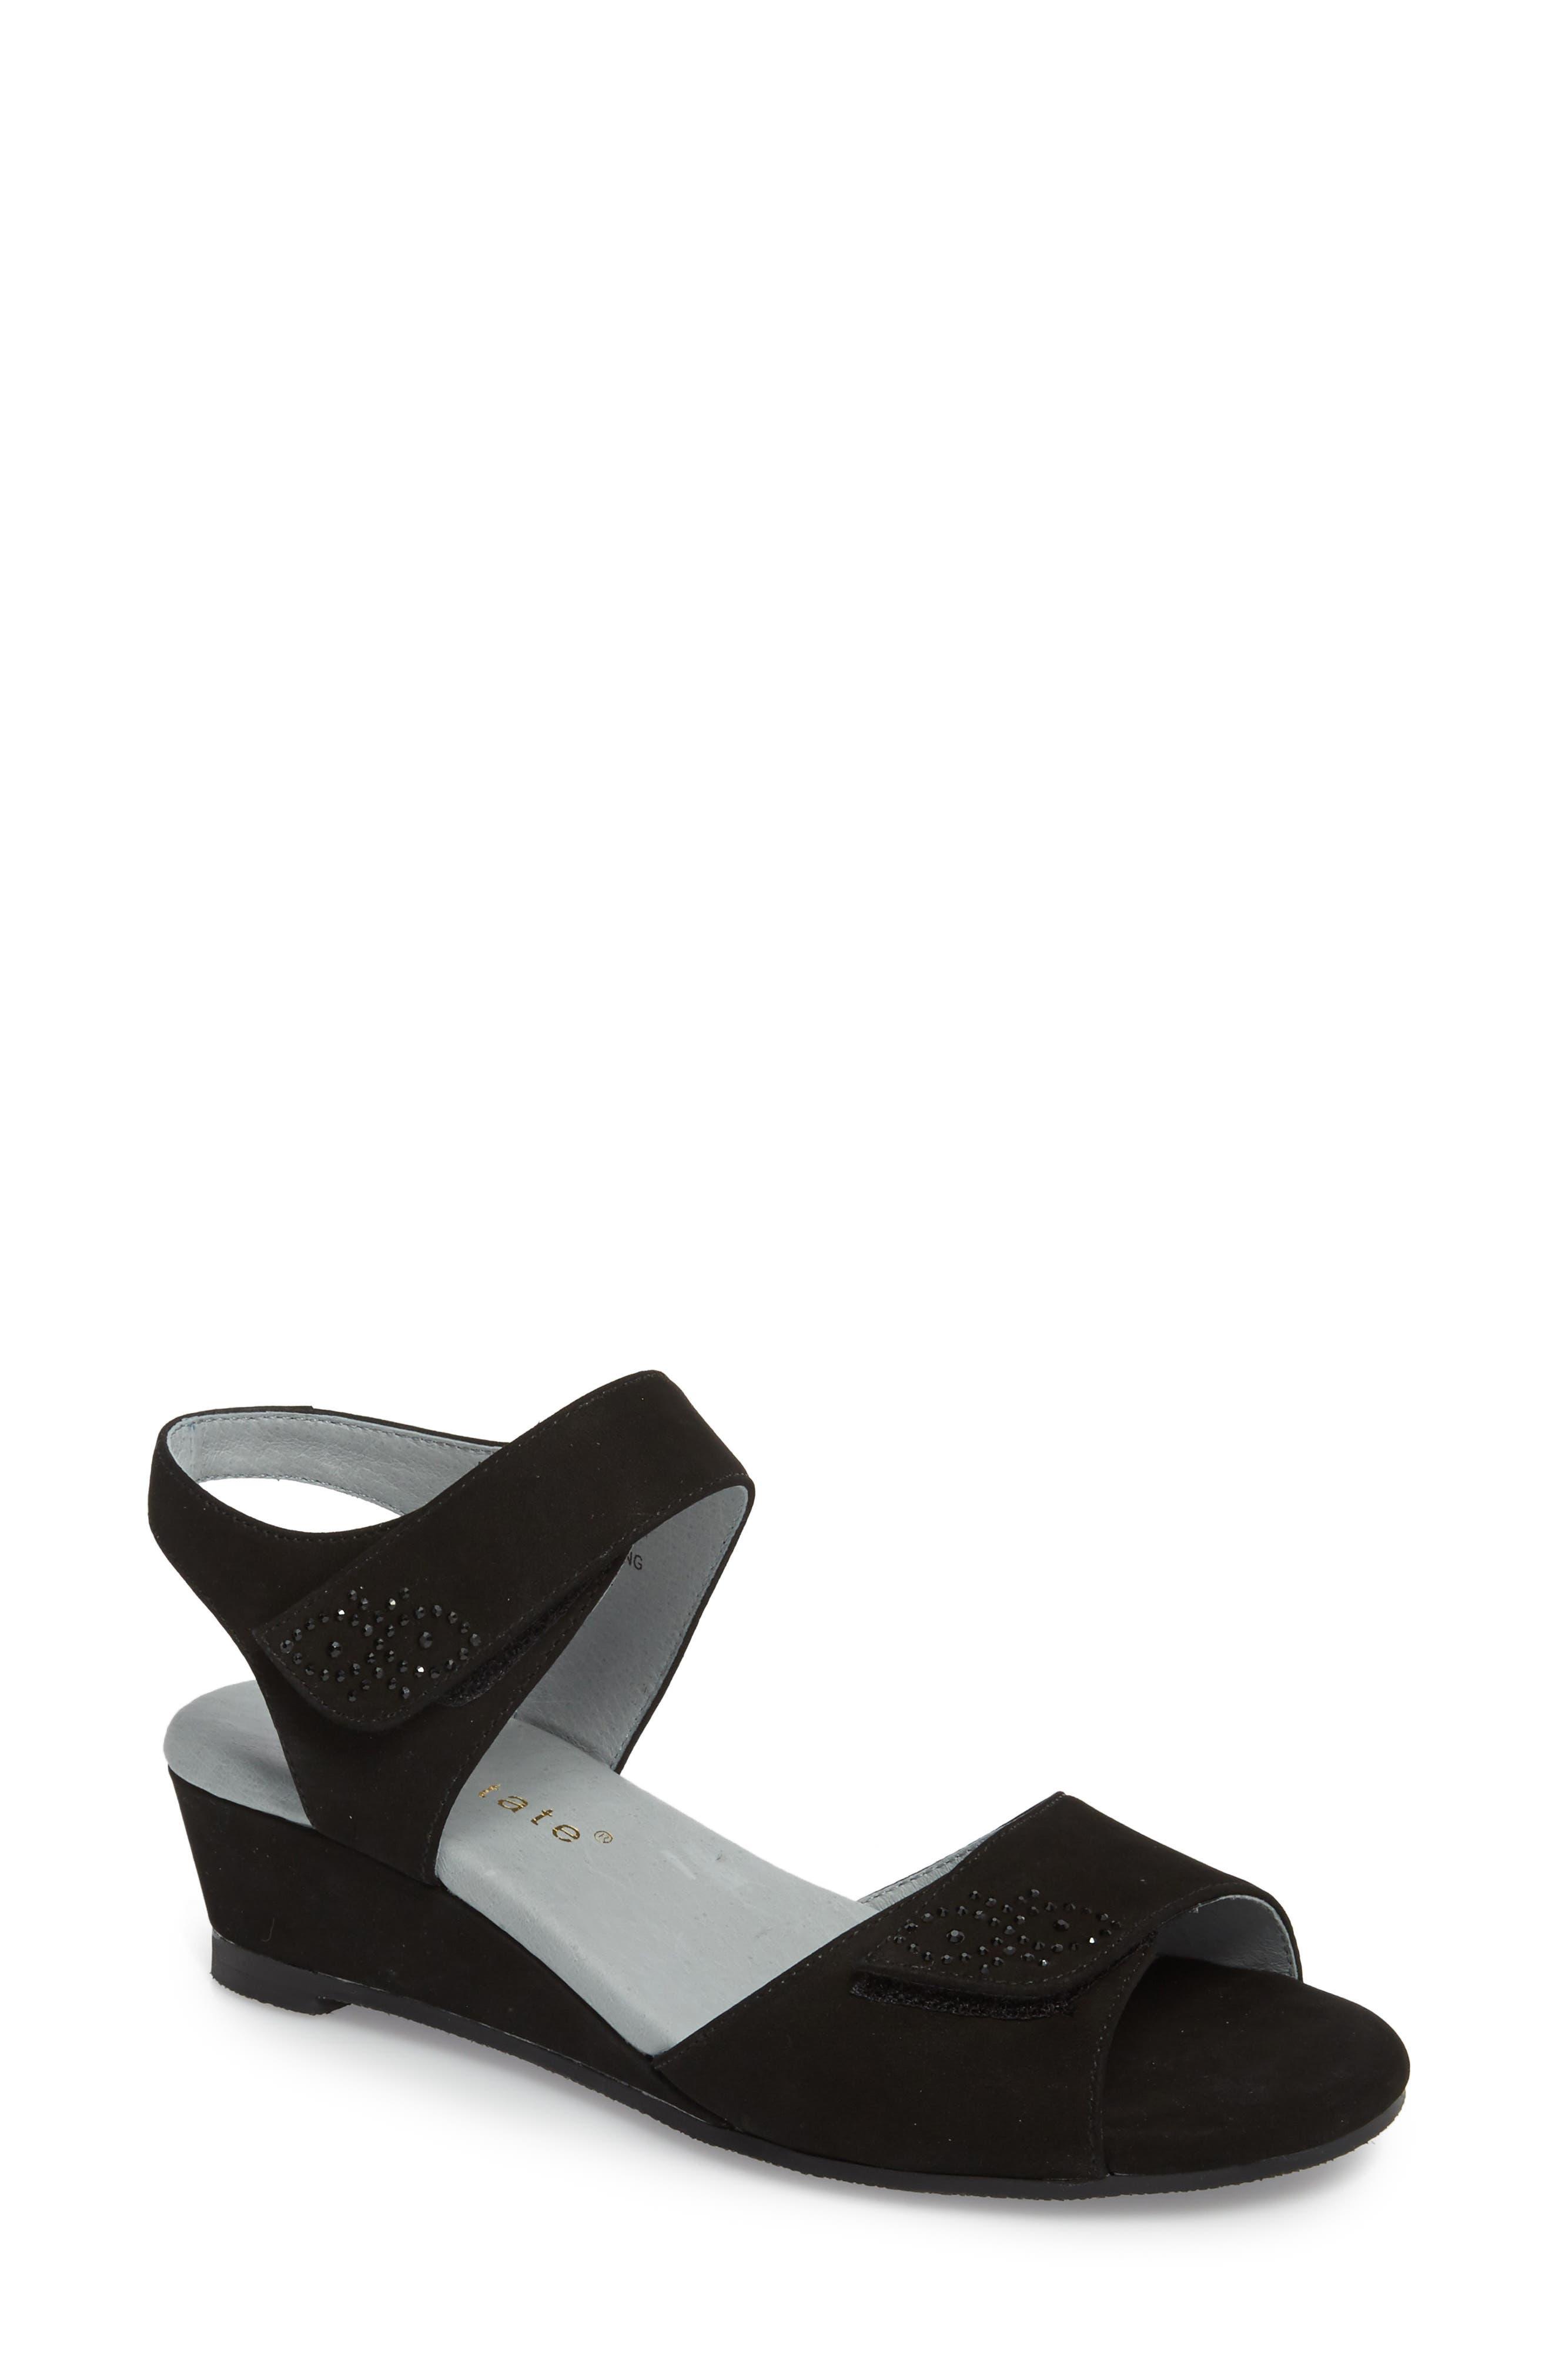 DAVID TATE, Queen Embellished Wedge Sandal, Main thumbnail 1, color, BLACK NUBUCK